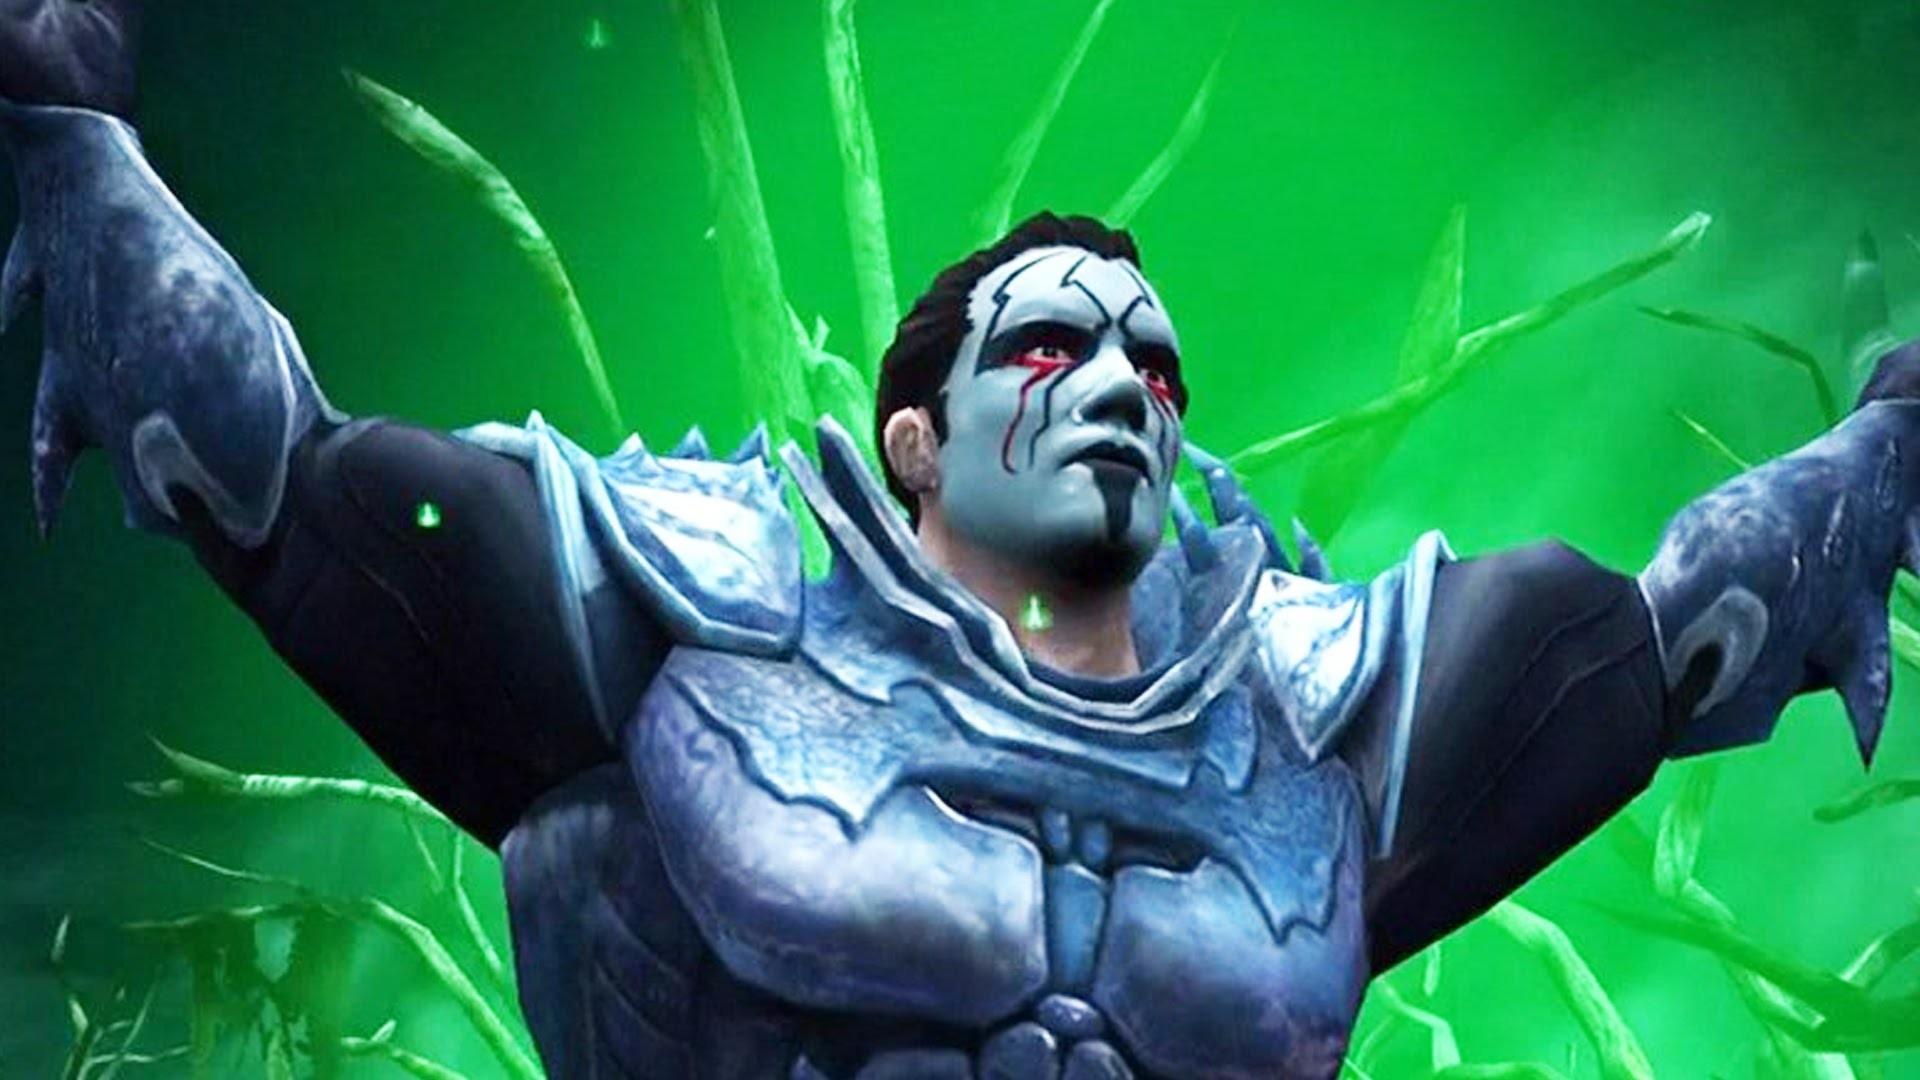 WWE Immortals – Scorpion Warrior Sting Super Finisher Attacks – YouTube